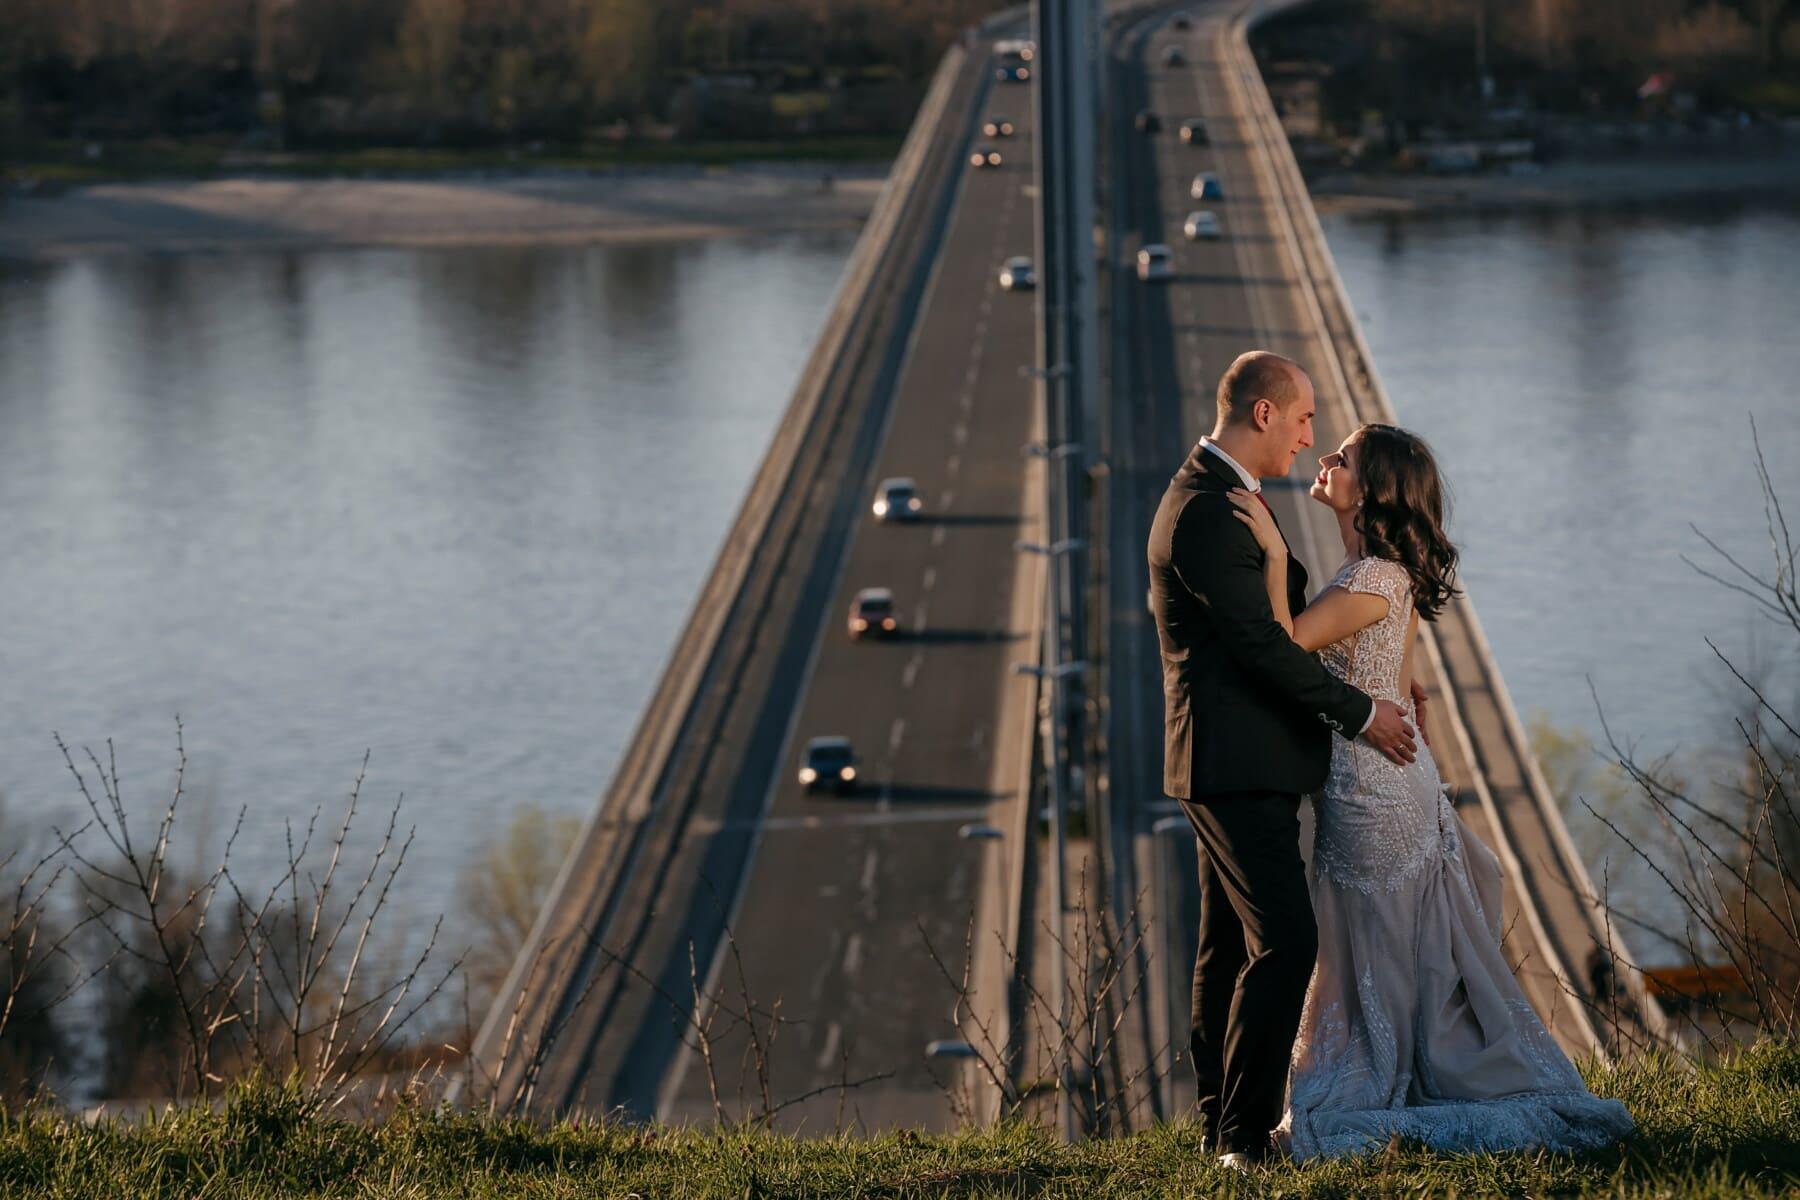 прегръдка, младоженец, Любов, булката, висящ мост, градска зона, градски пейзаж, мост, залез, вода